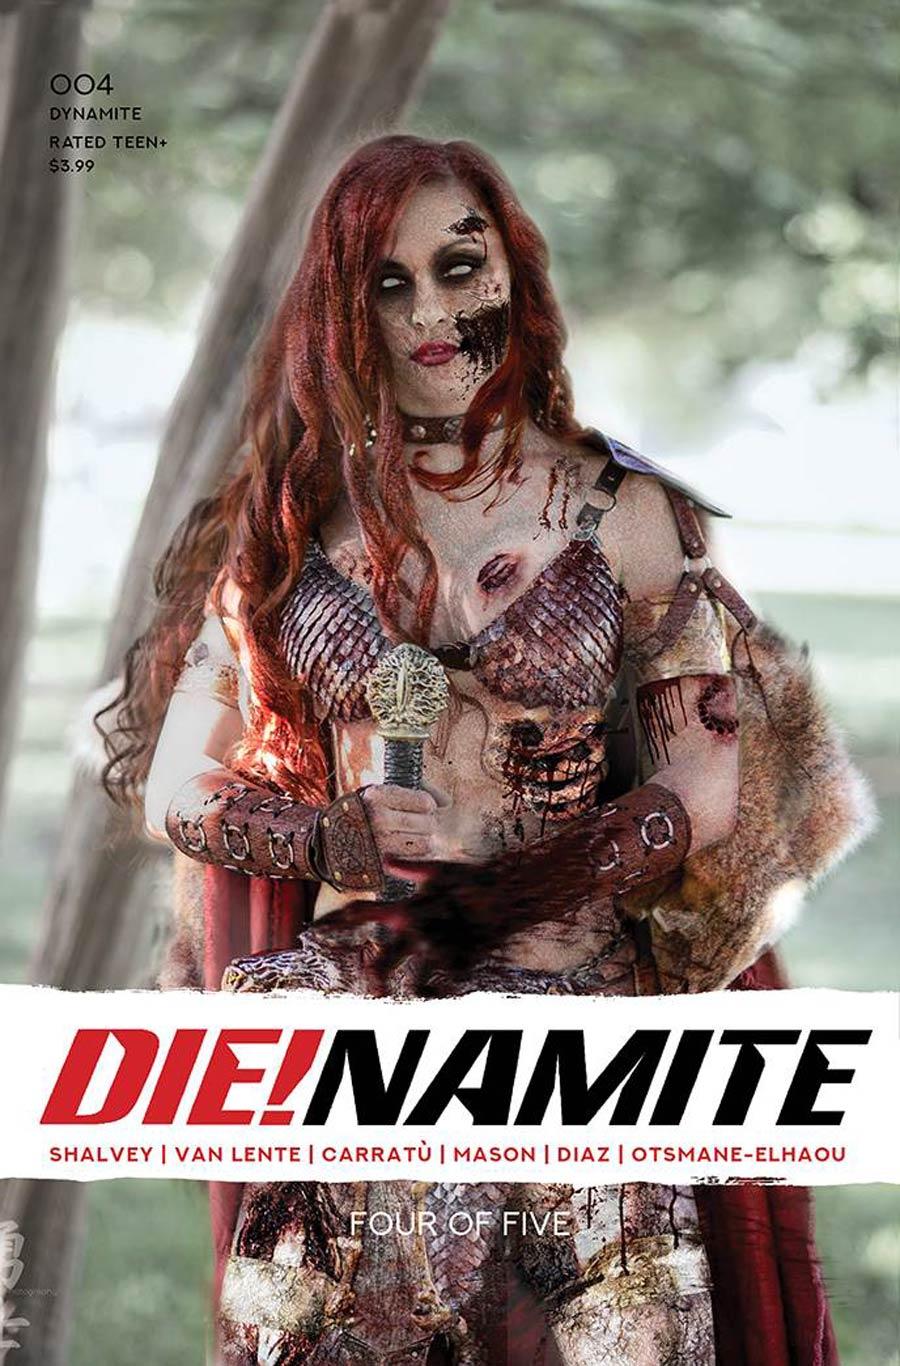 DieNamite #4 Cover G Variant Savannah Polson Zombie Cosplay Photo Cover